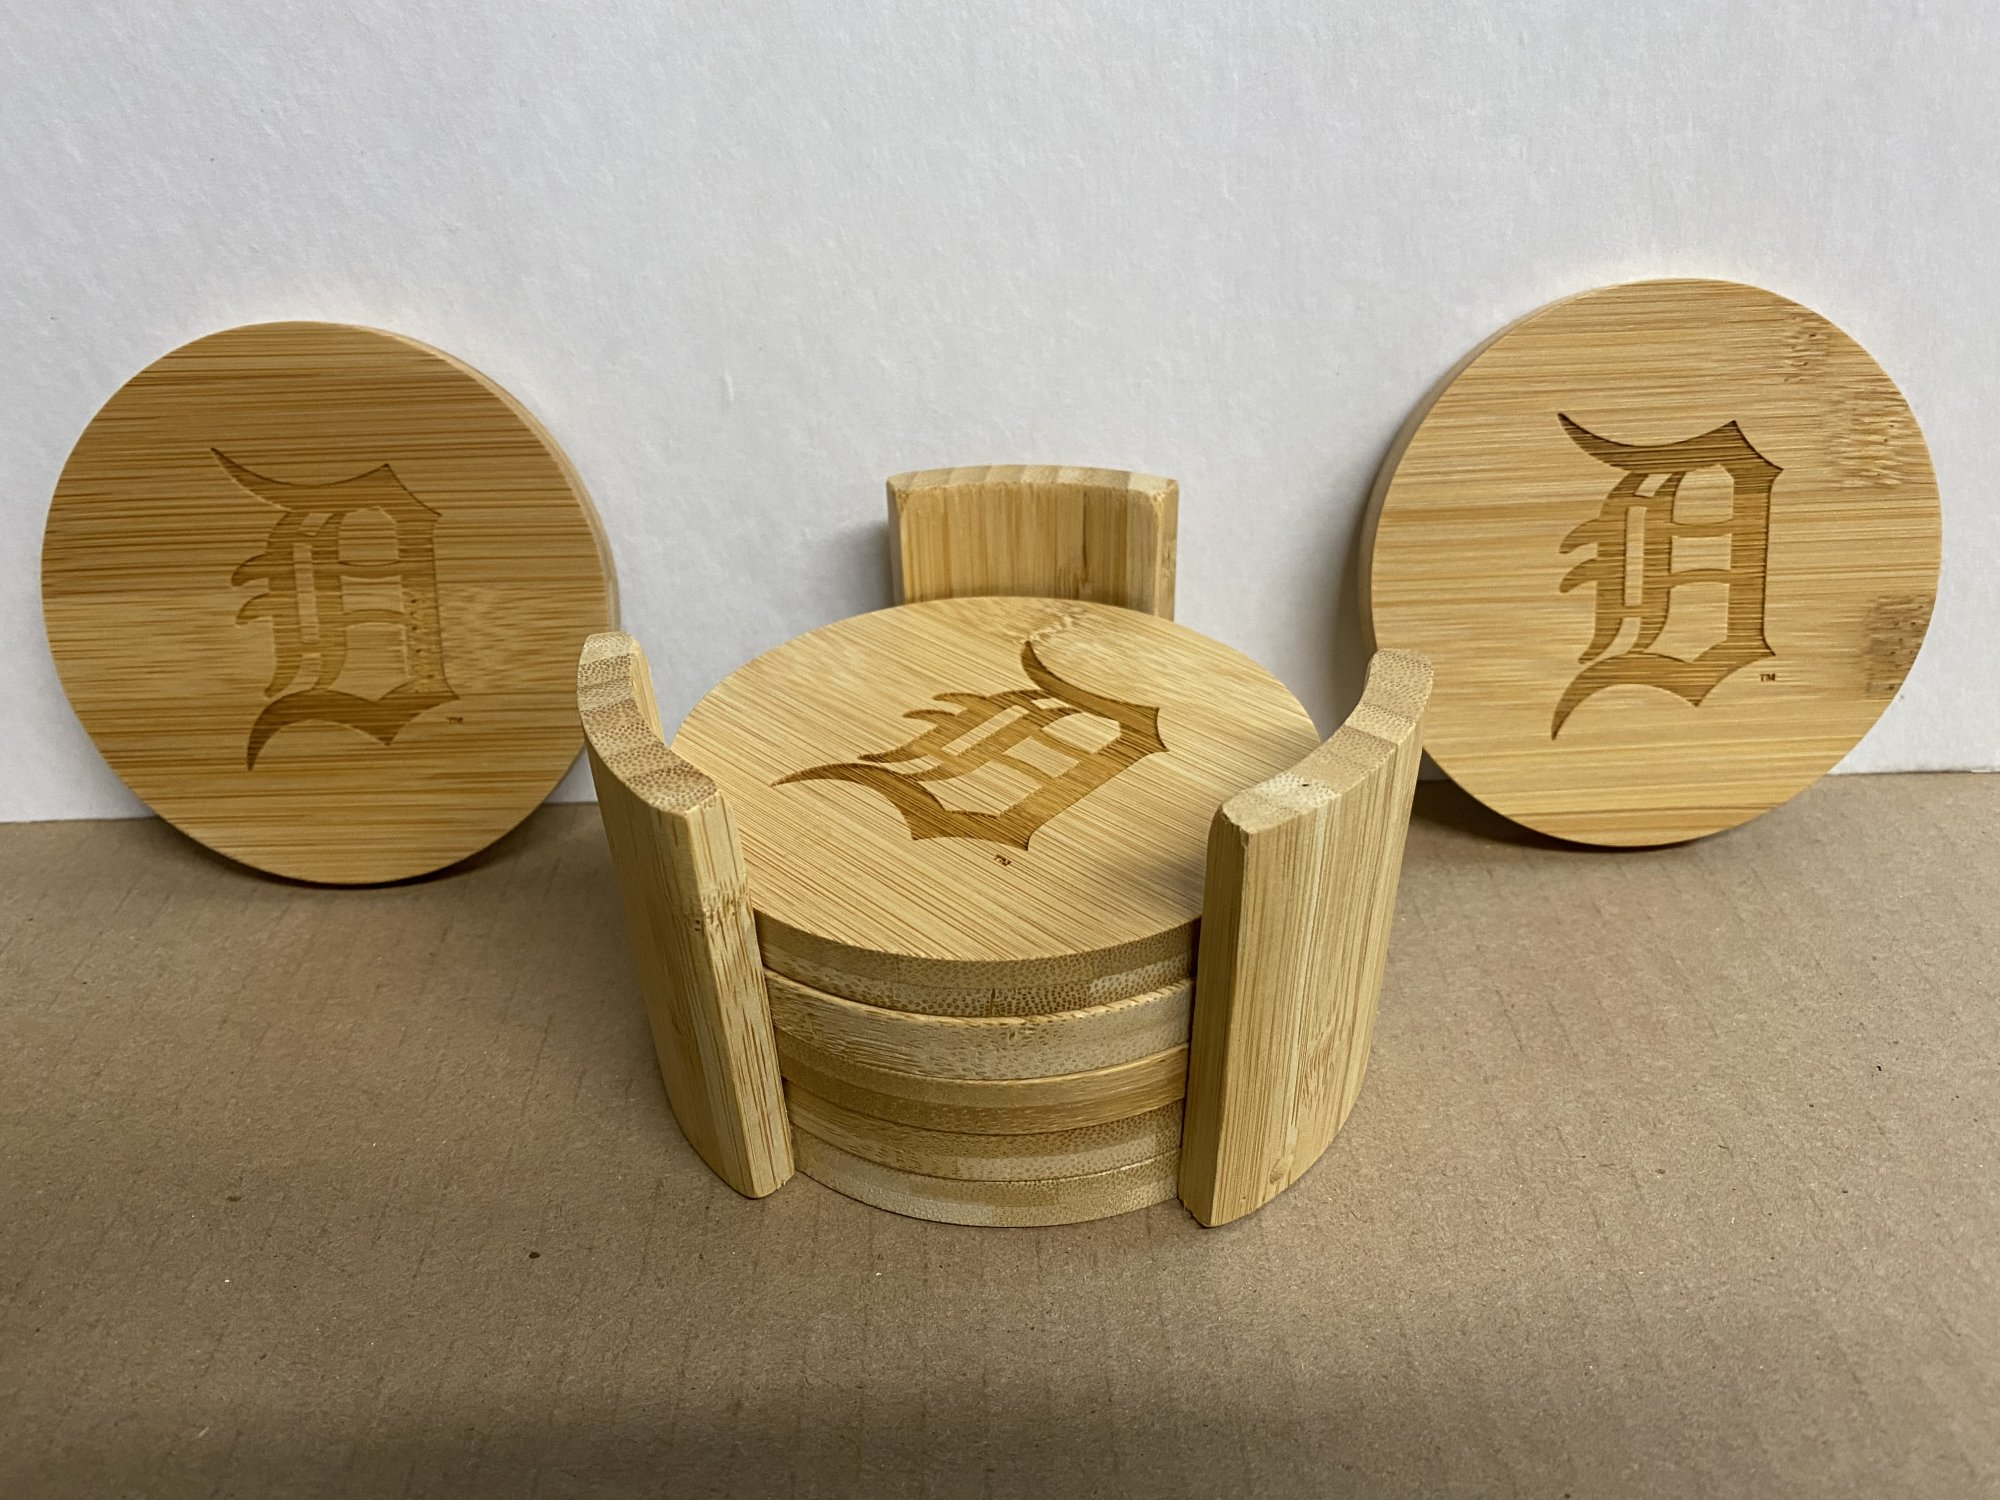 Detroit Tigers Bamboo 7 Piece Set